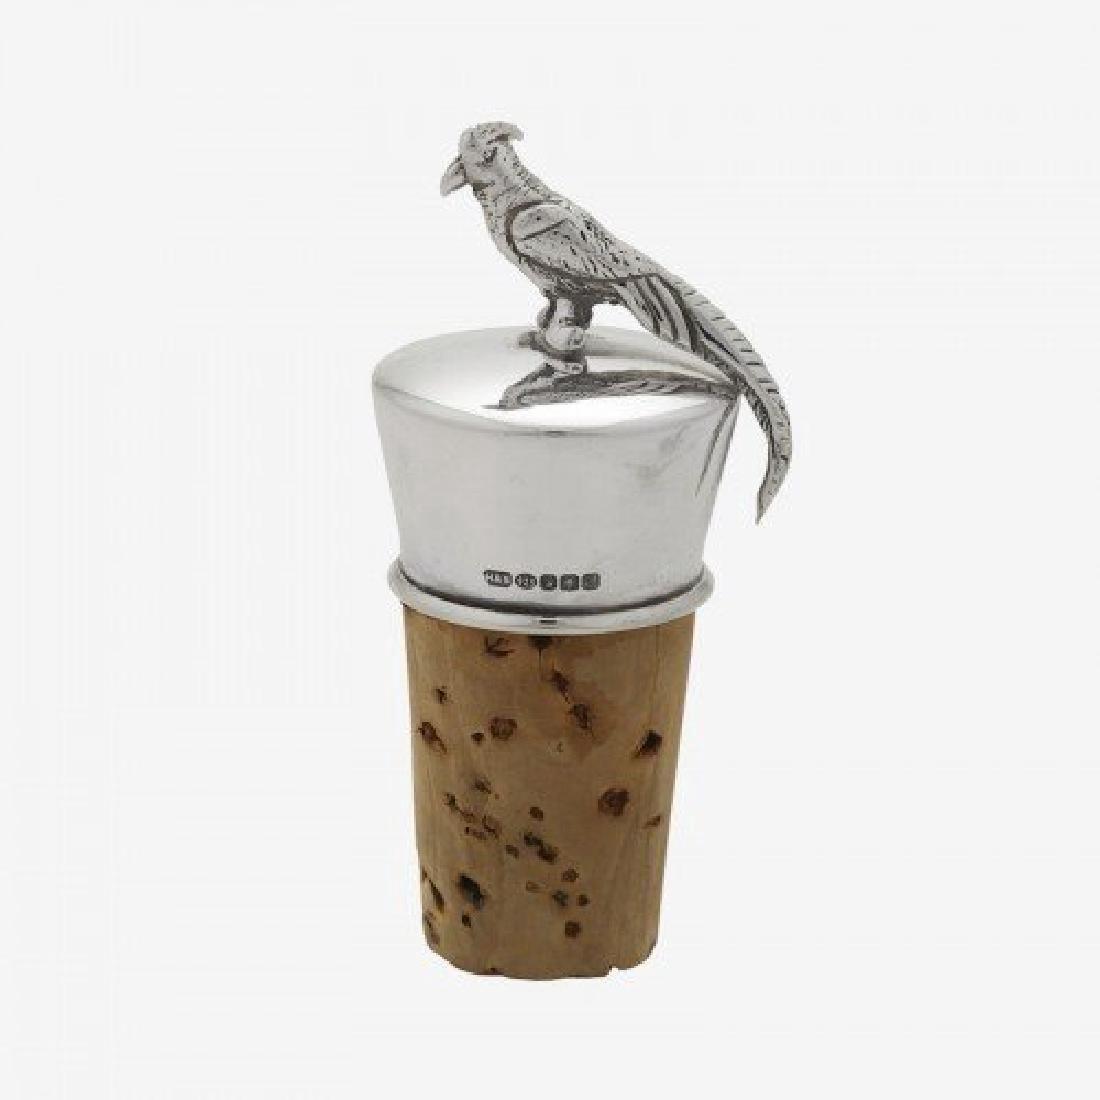 Scottish Silver Figural Pheasant Bottle Stopper